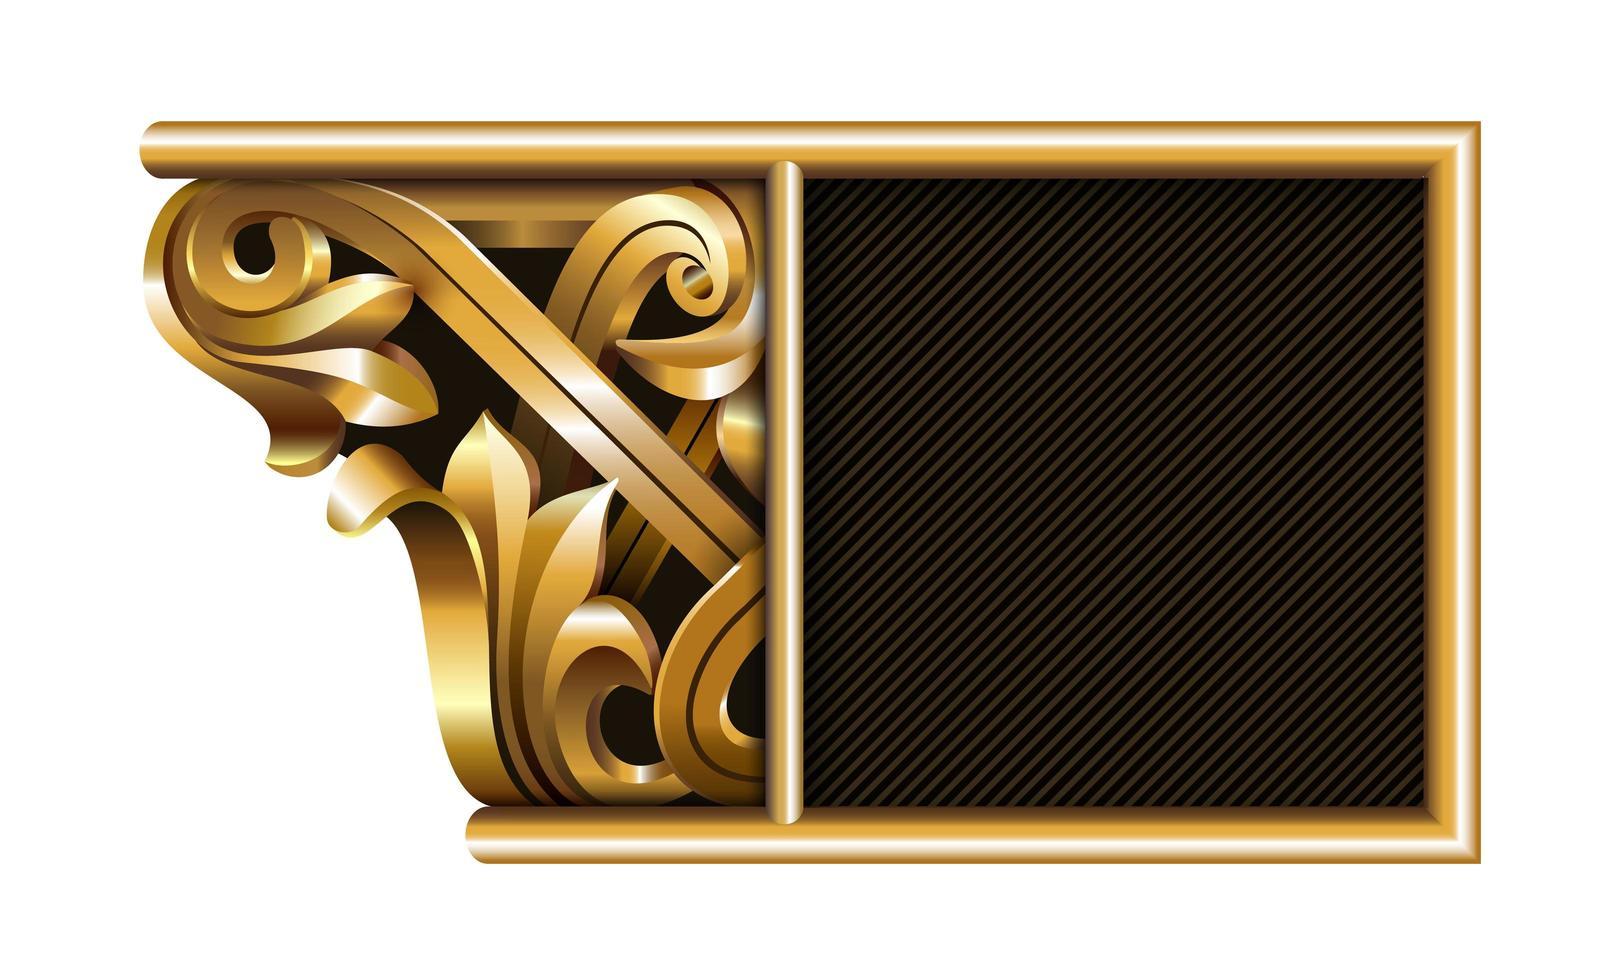 Gold geschnitztes Säulendesign vektor